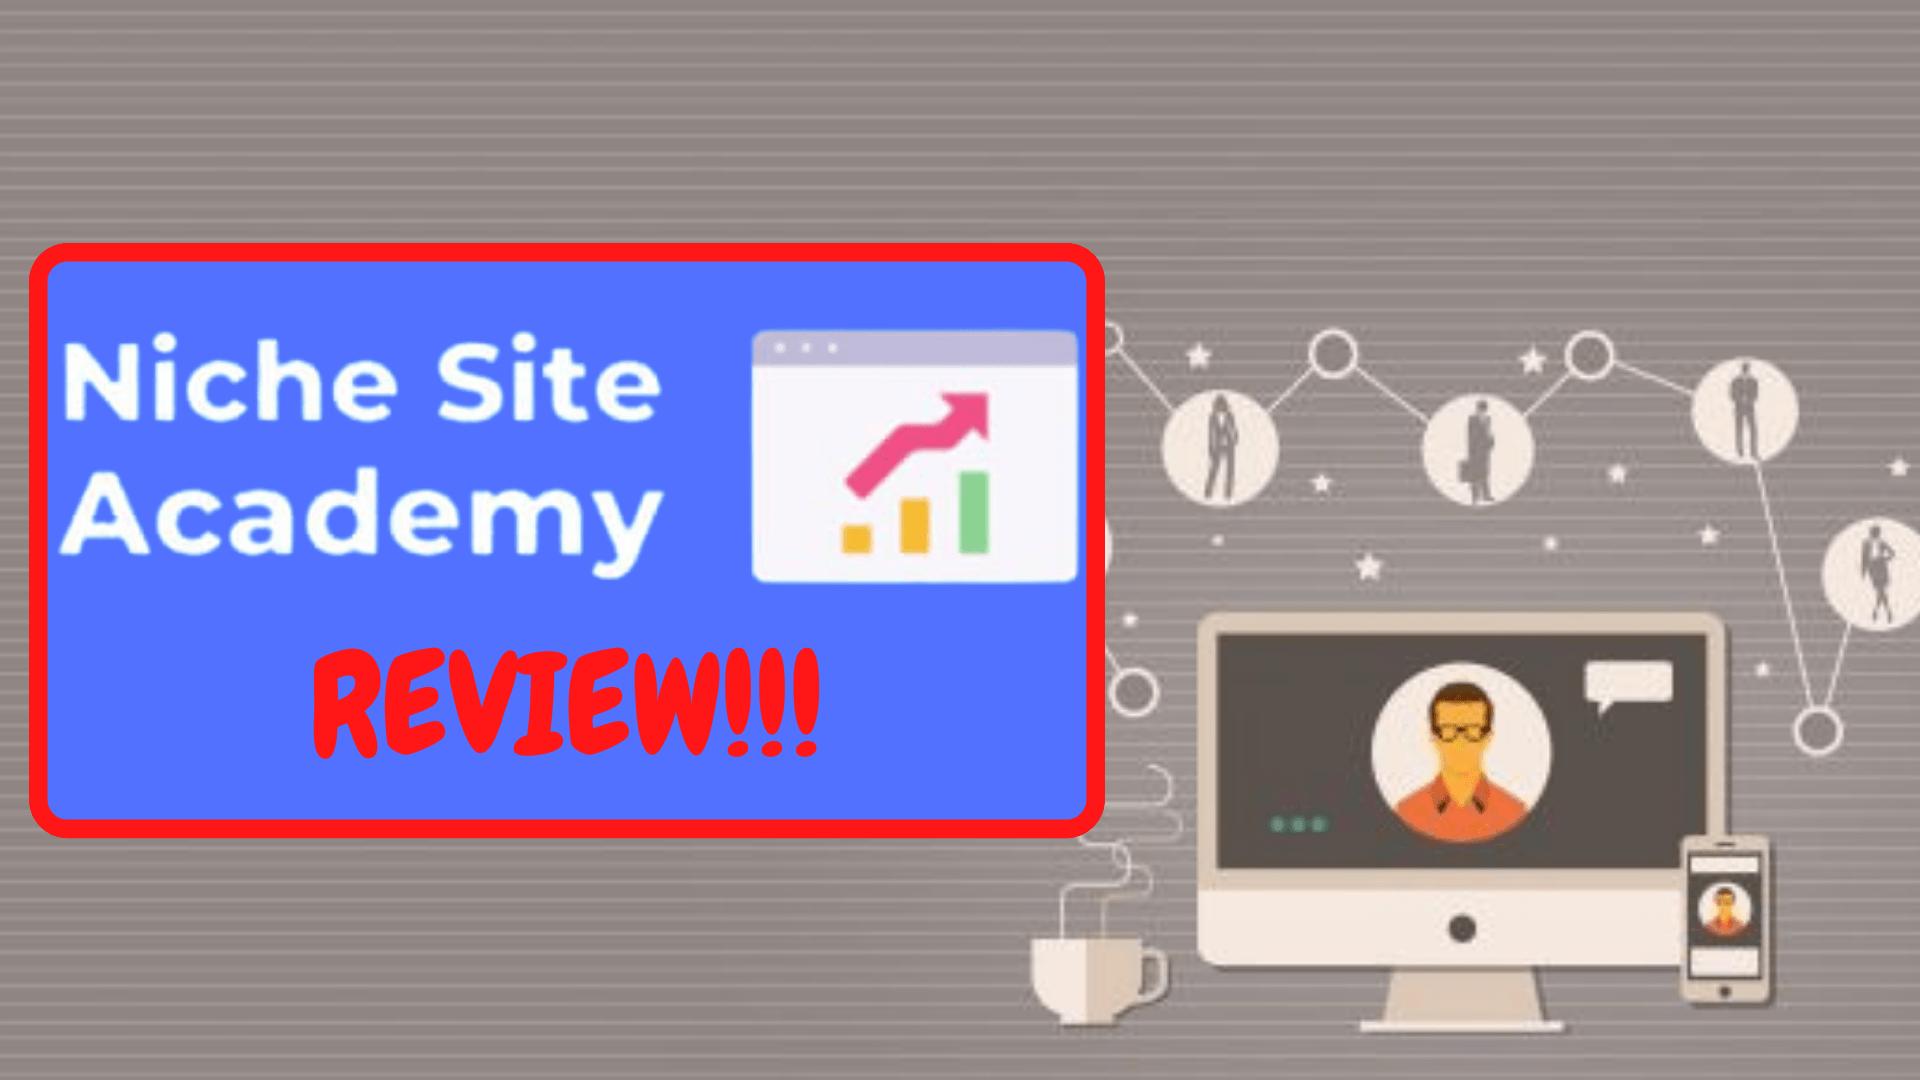 Niche Site Academy Frontpage